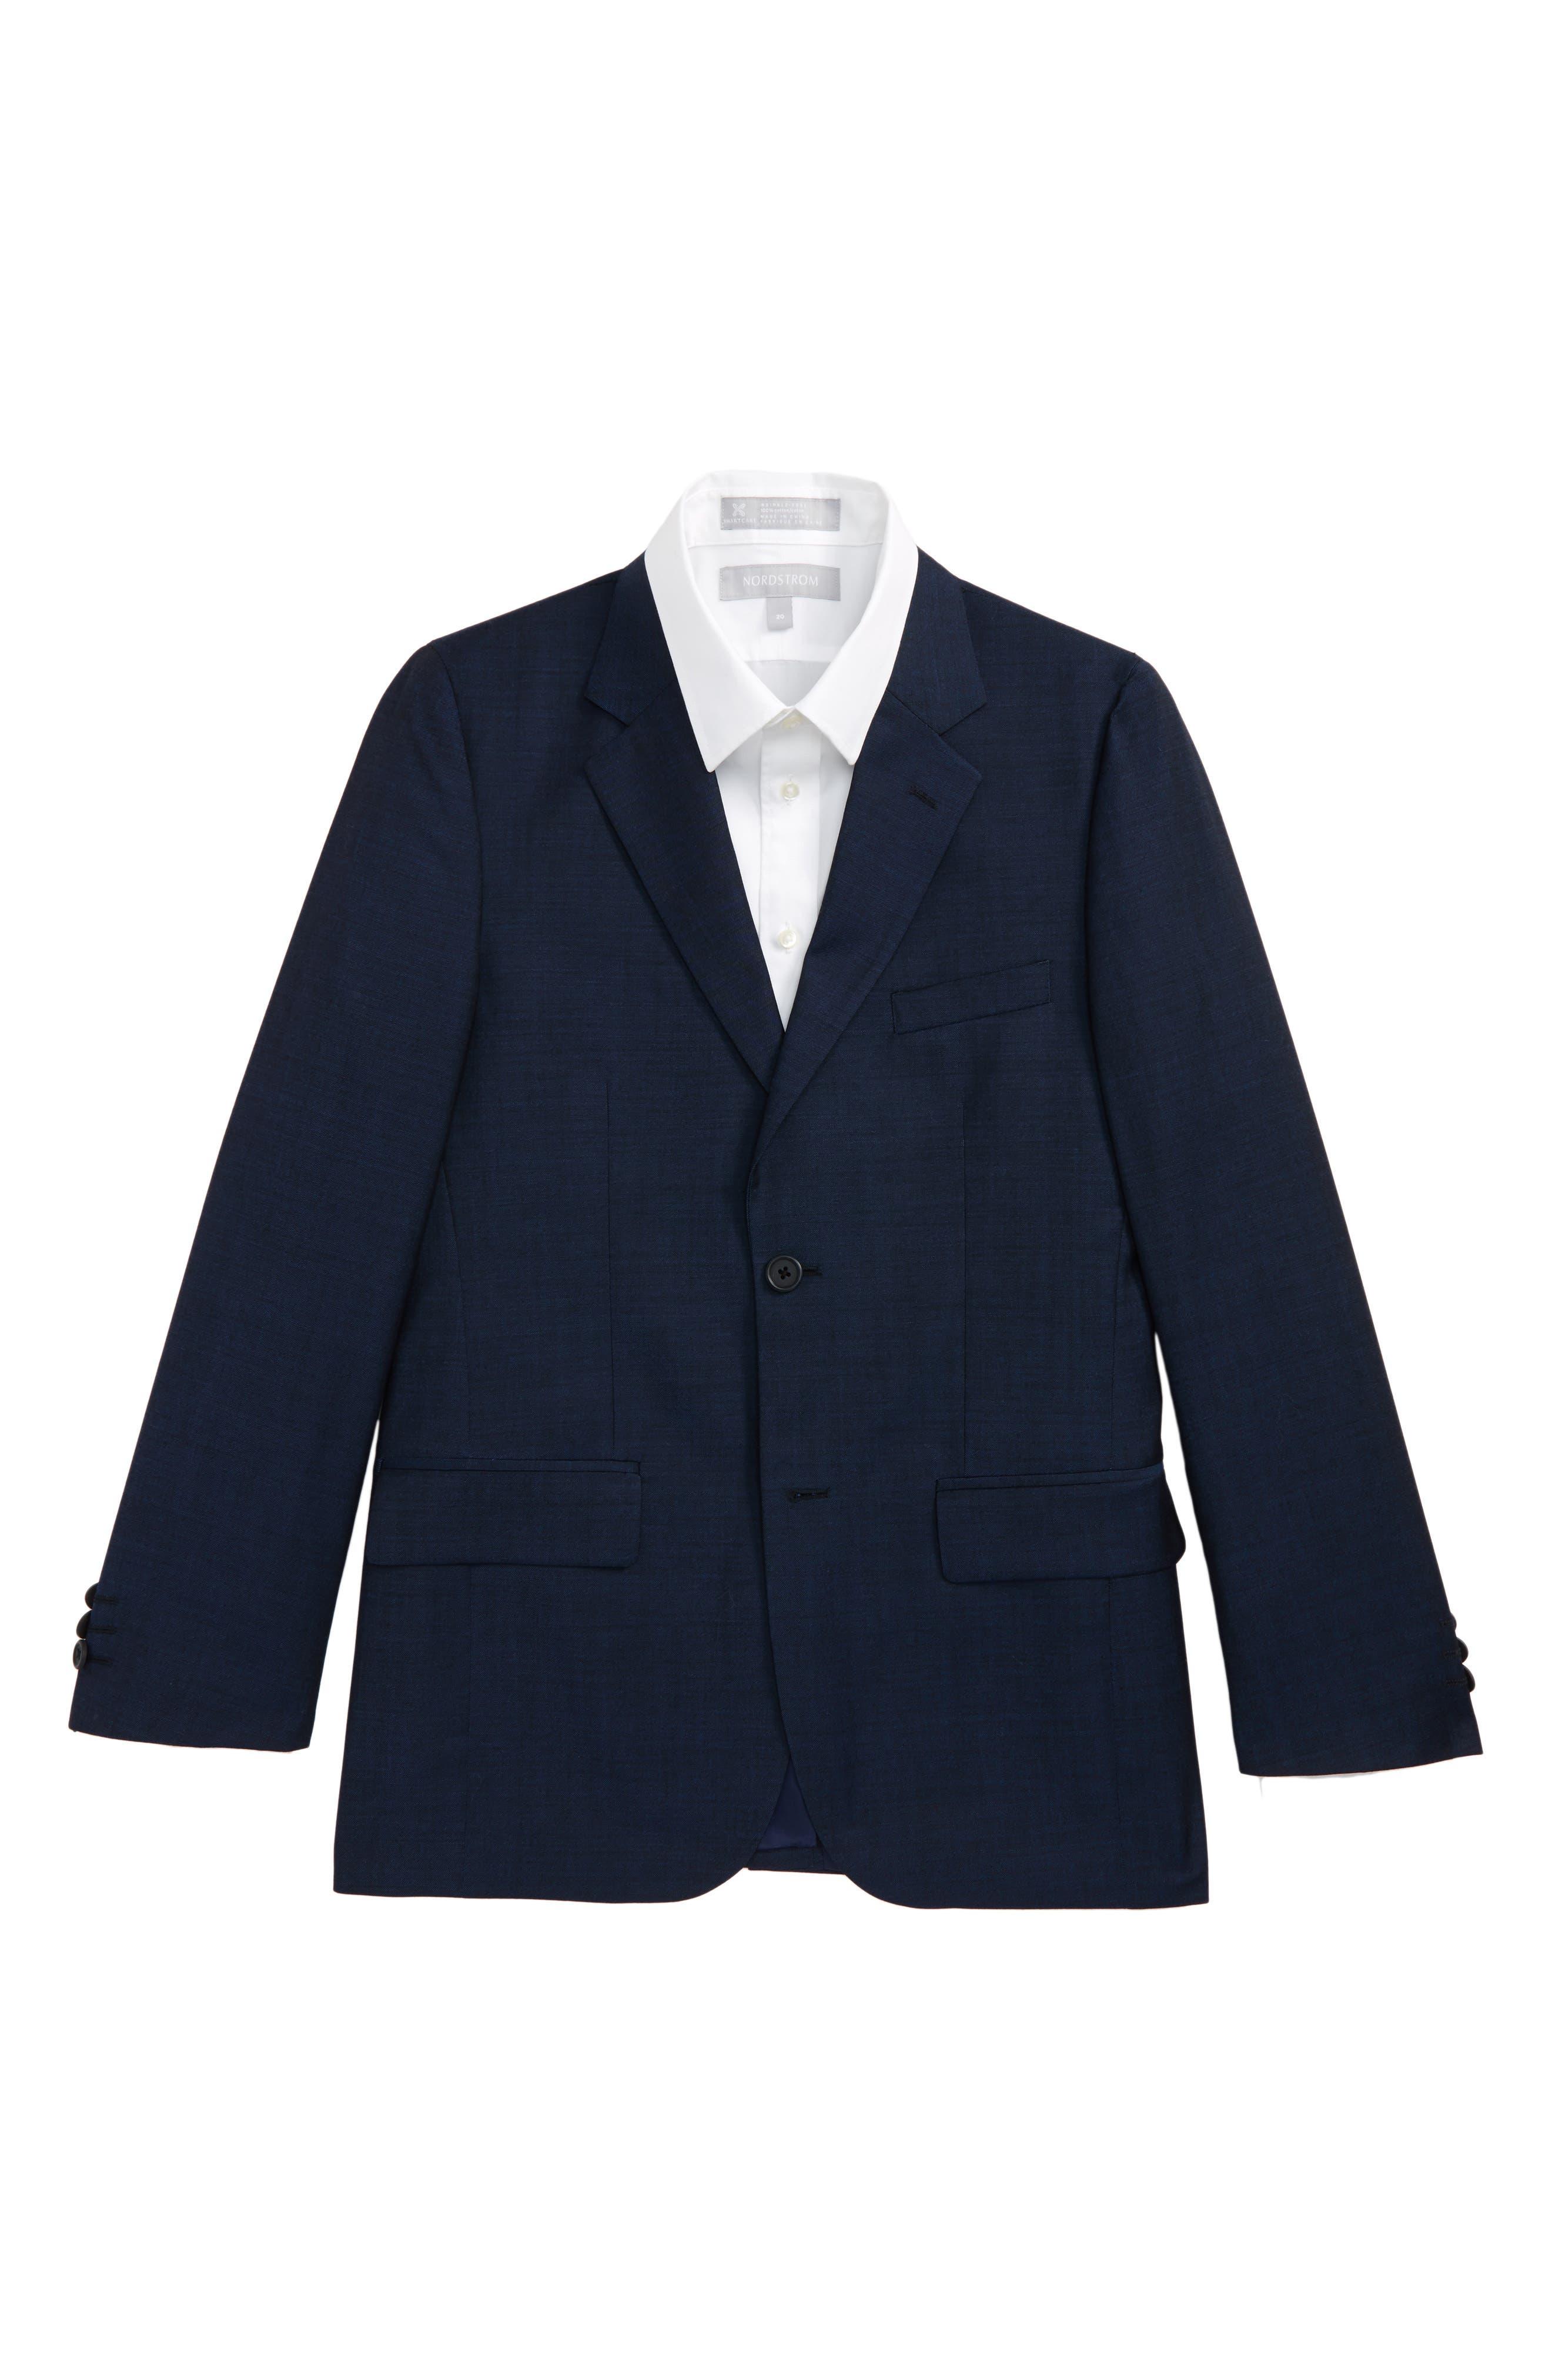 Main Image - JB Jr Wool Sport Coat (Big Boys)